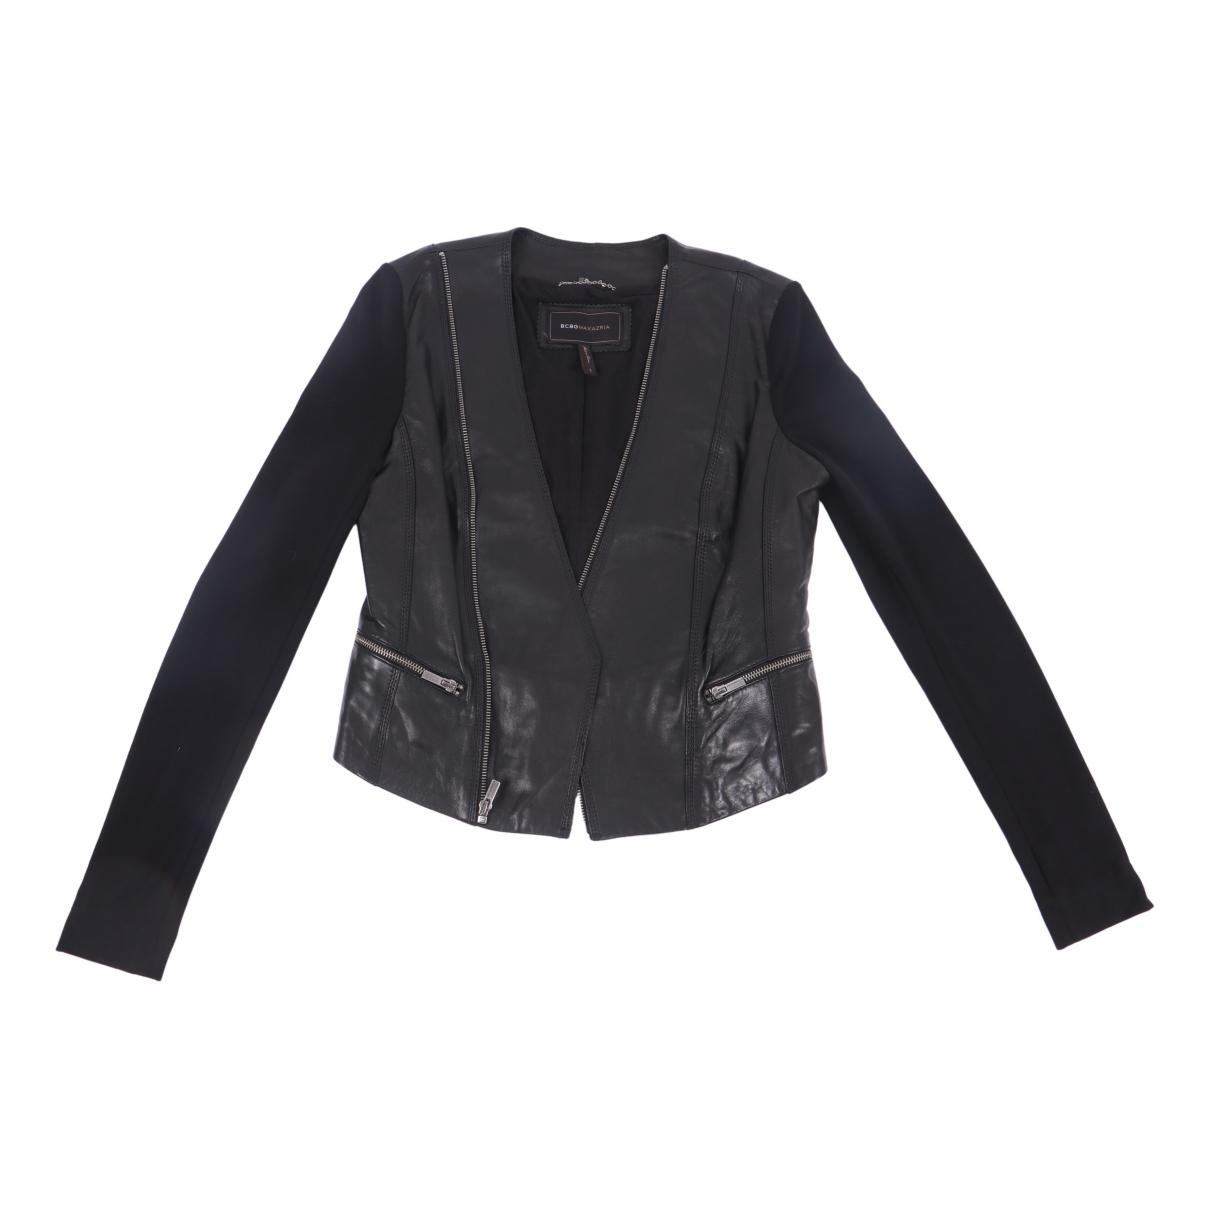 Bcbg Max Azria N Black Leather jacket for Women S International